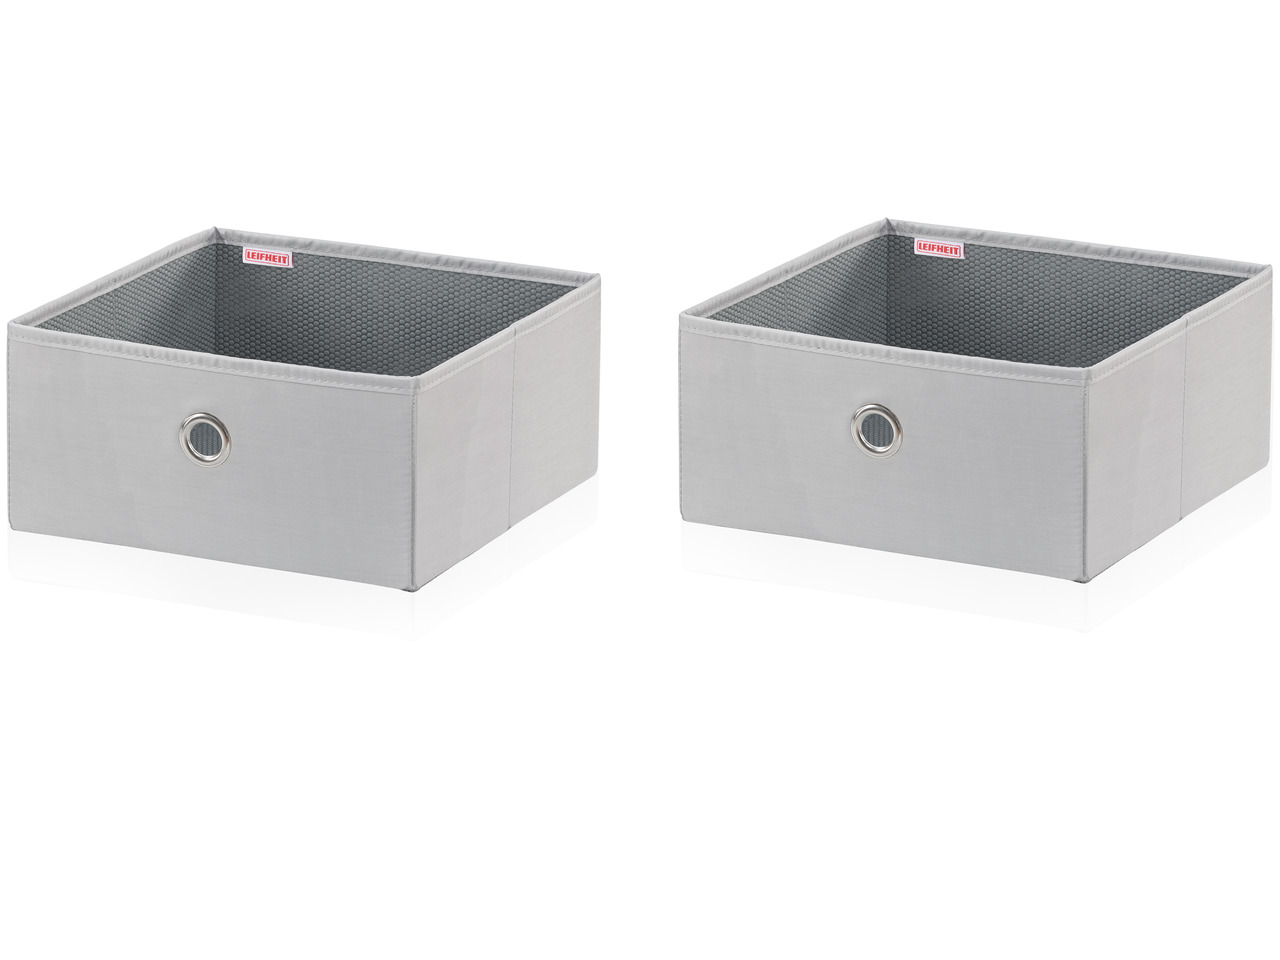 LEIFHEIT Malý box, 2 ks – grey LEIFHEIT 80008